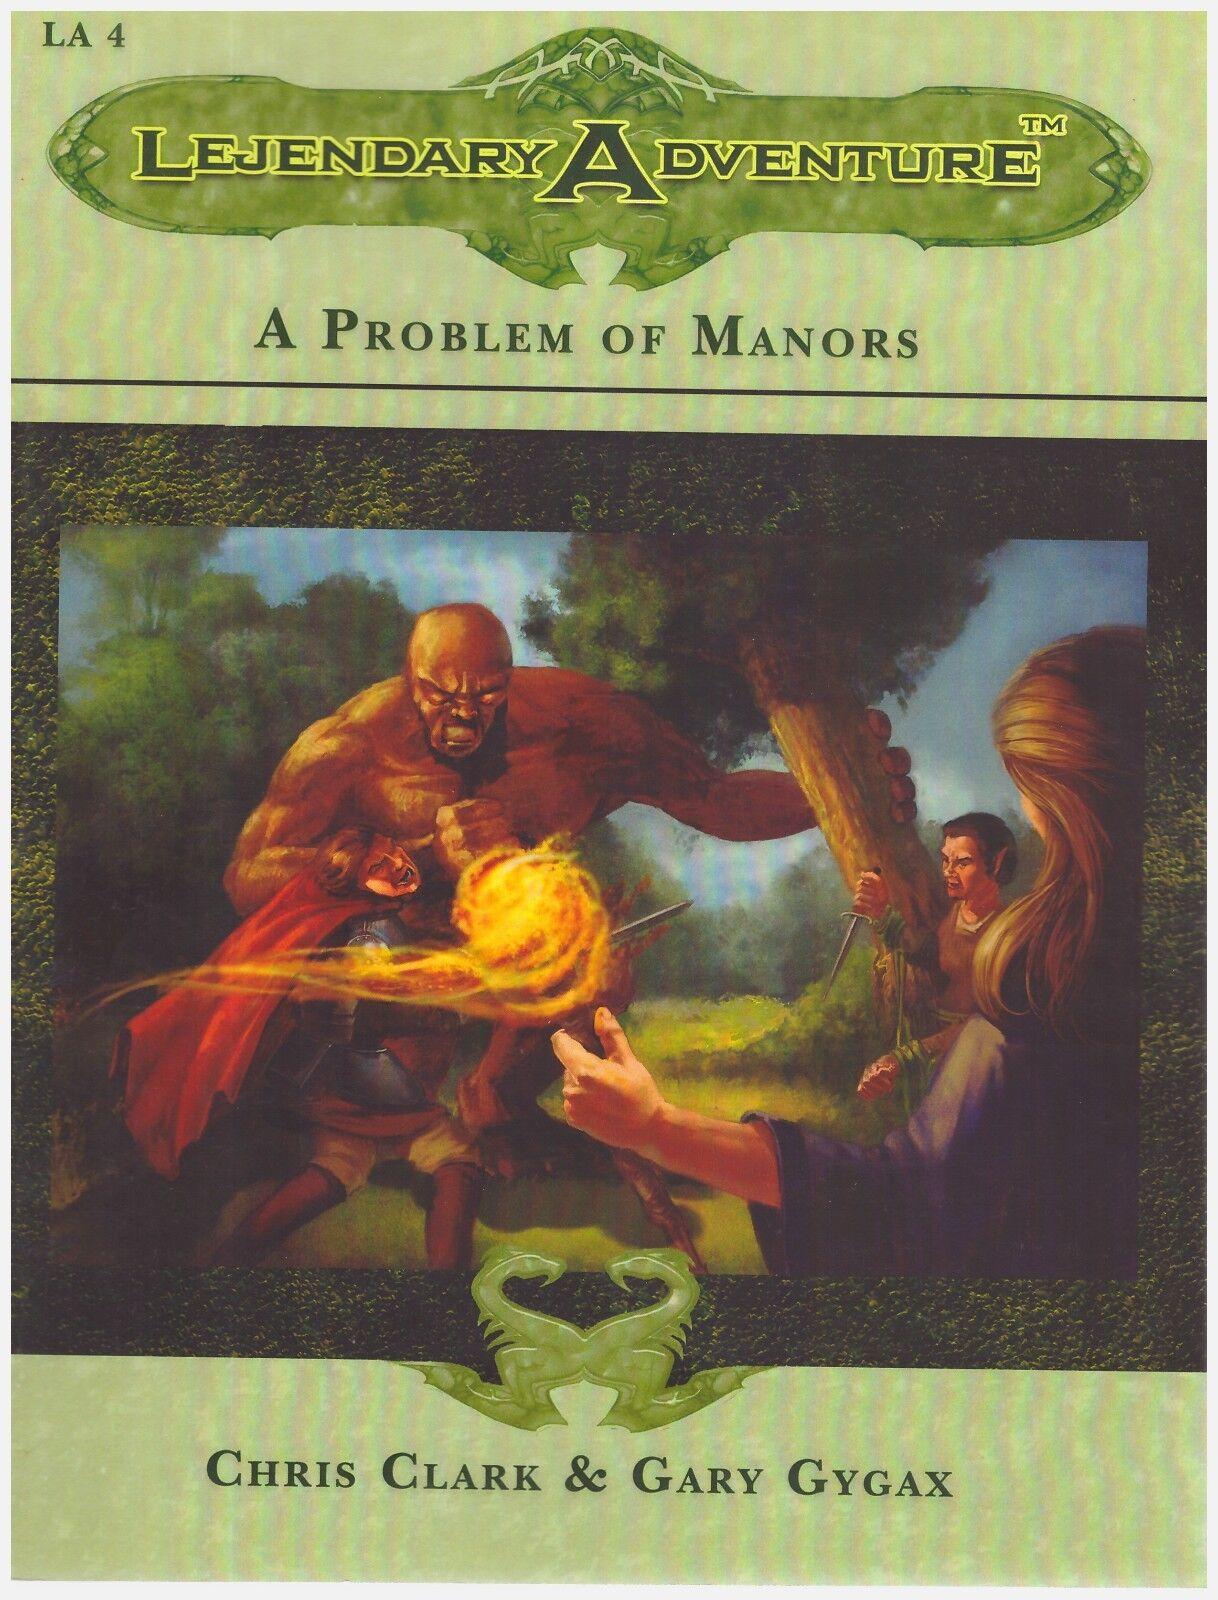 Chris Clark & Gary Gygax: Lejendary Adventure - A Problem of Manors